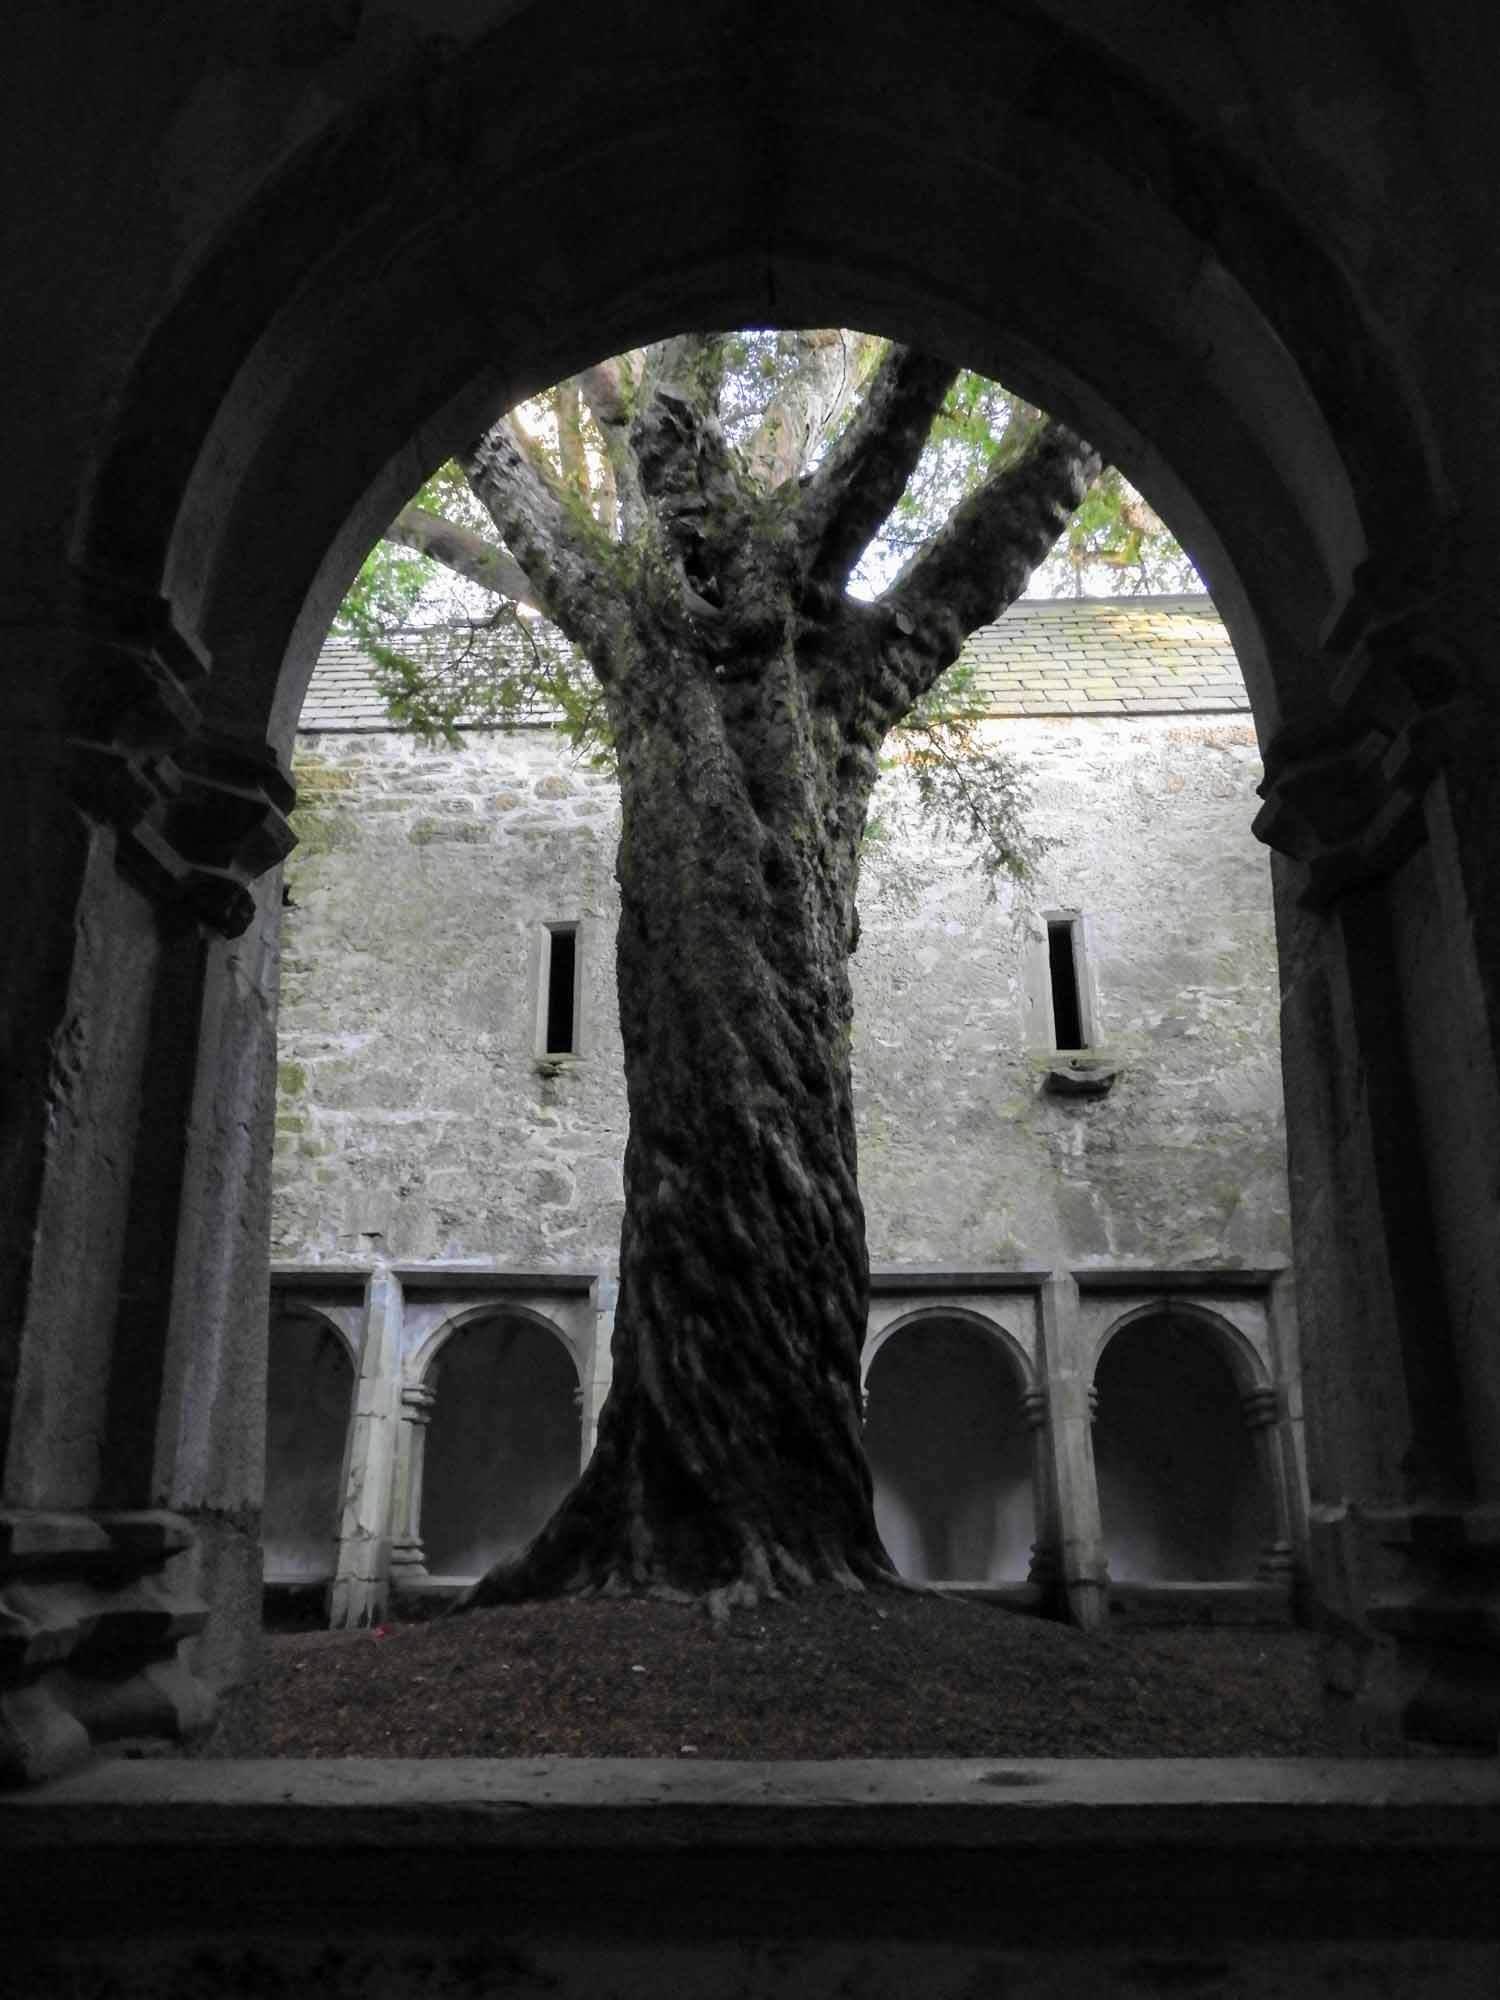 ireland-killarney-muckross-abby-ruins-tree-courtyard.jpg